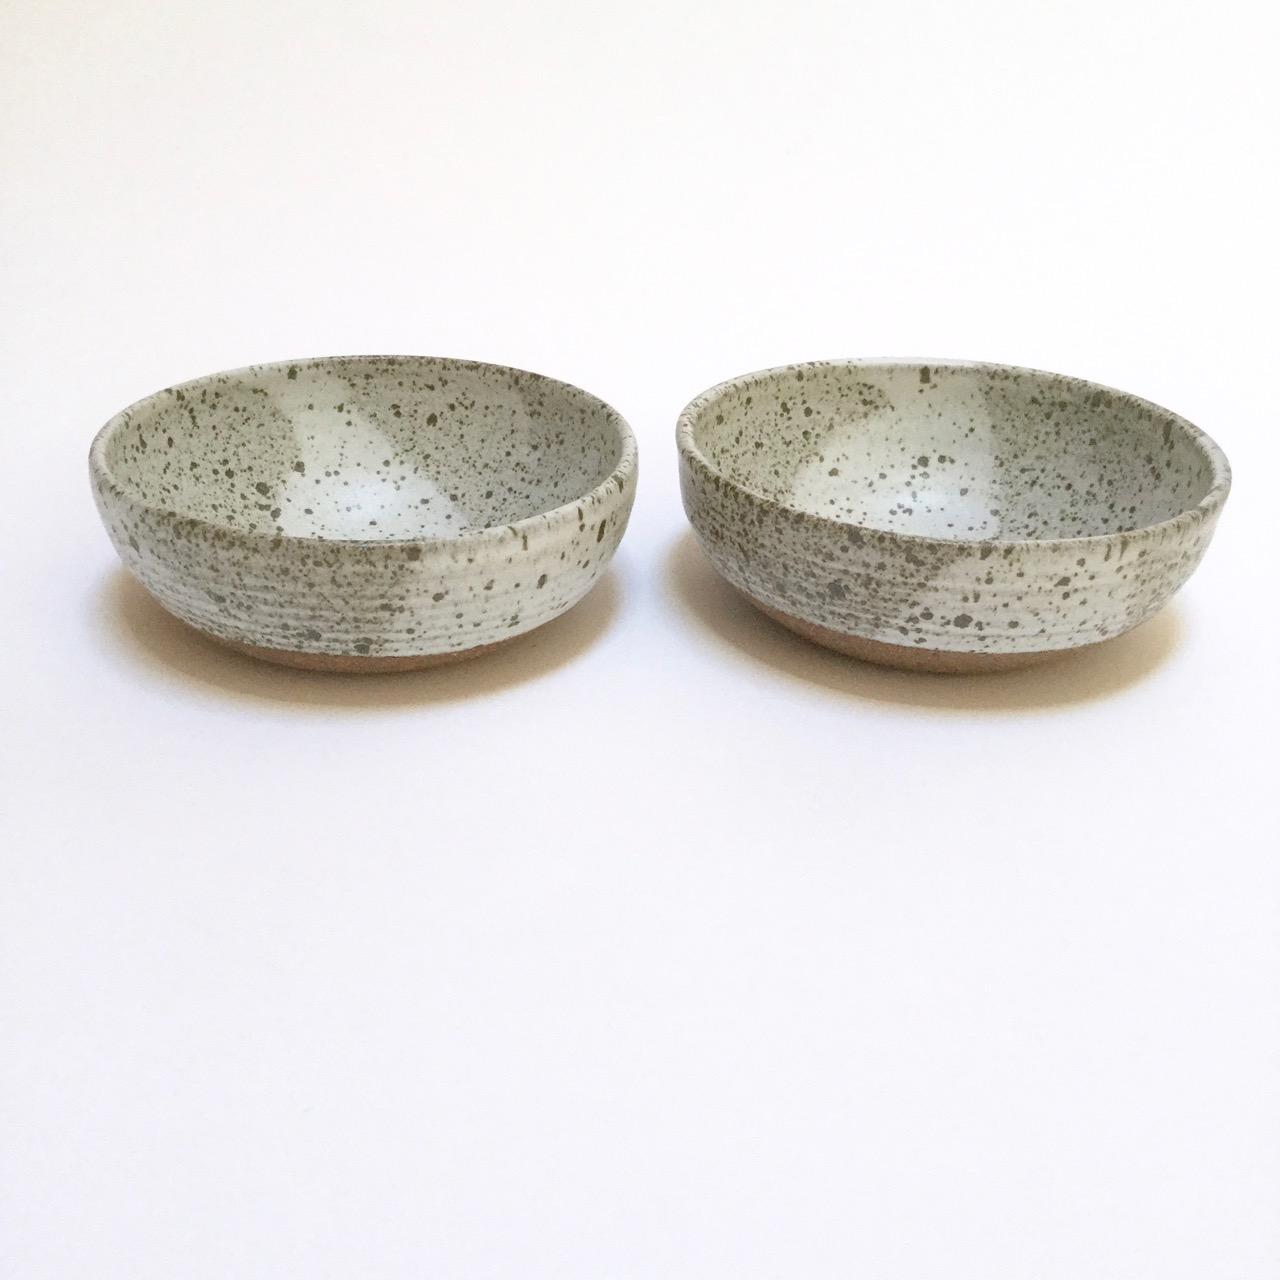 1129 Pair speckled bowls side.jpg